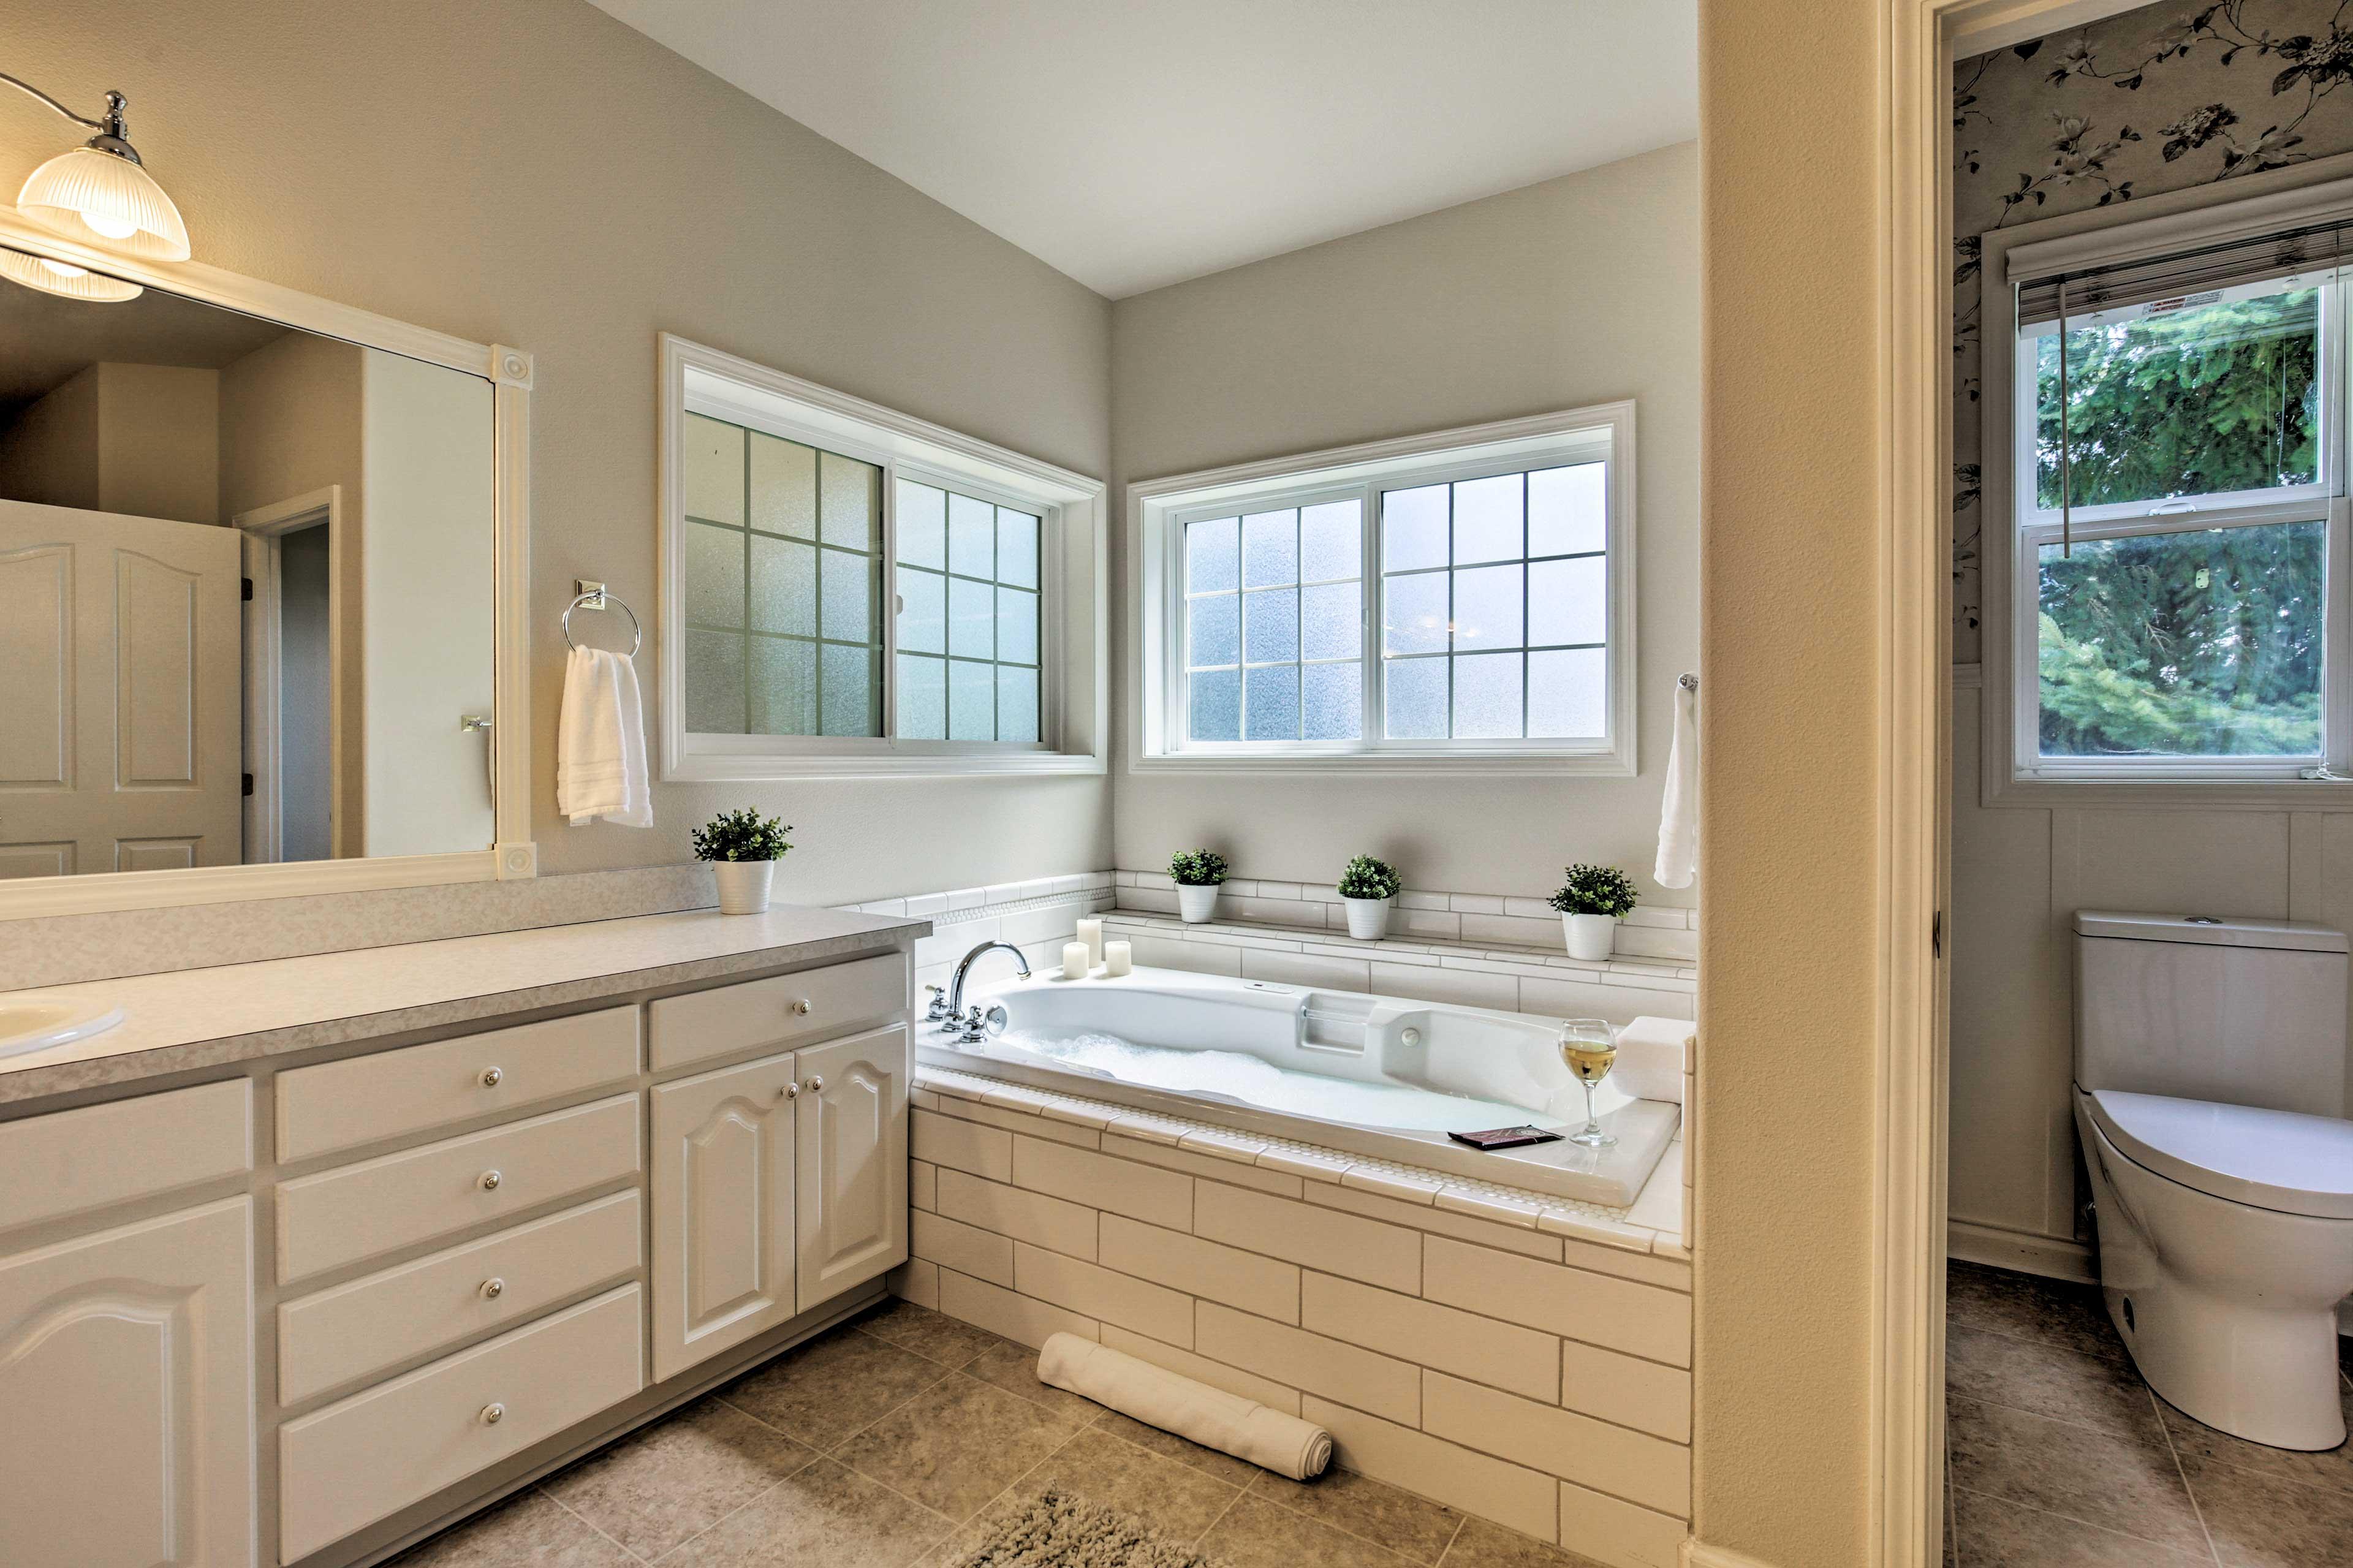 Master Bathroom | Jetted Tub